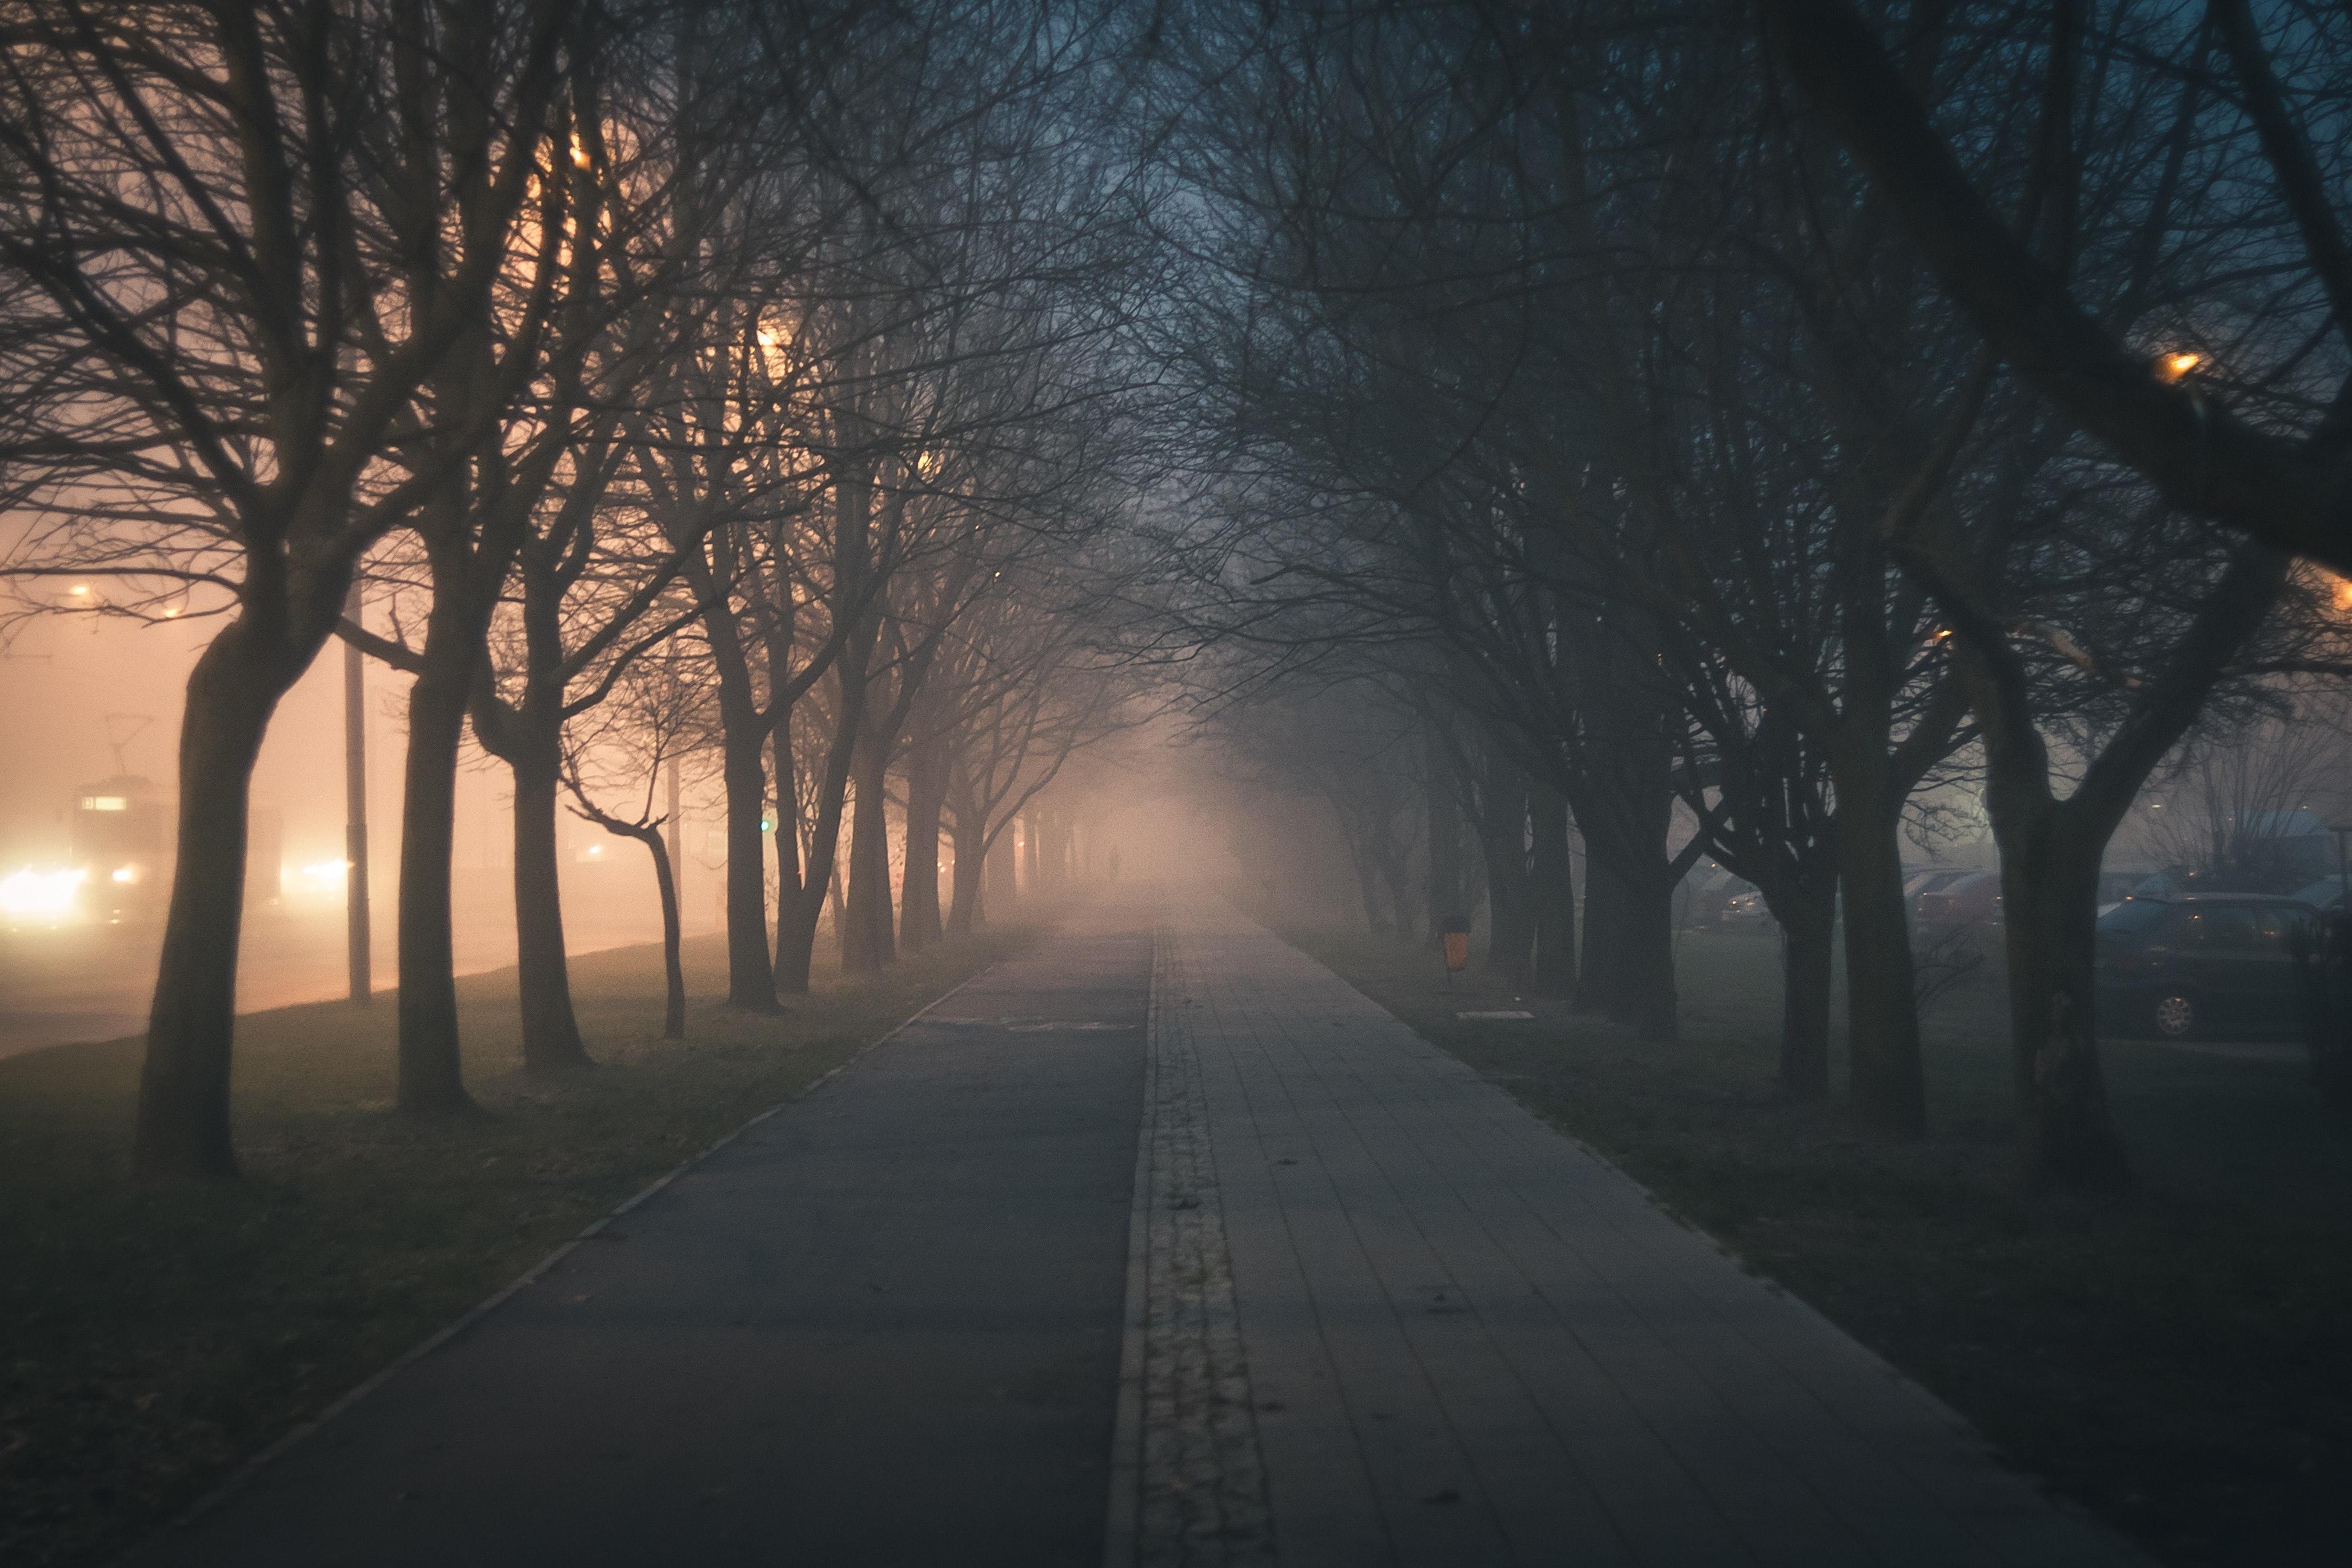 Breathtaking night images pexels free stock photos - Good night nature pic ...